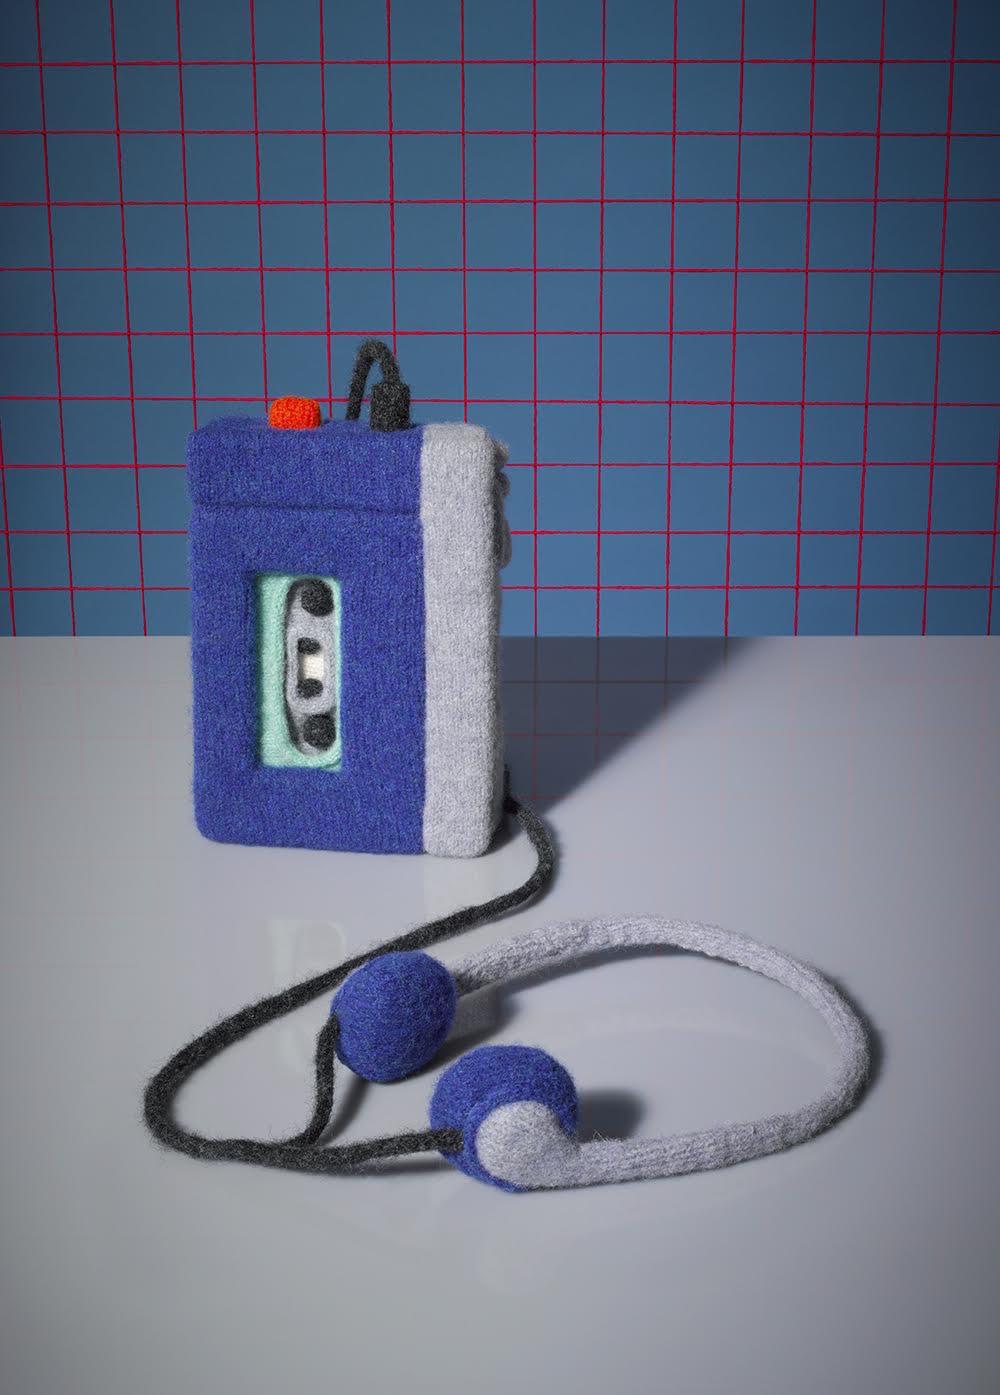 Sony Walkman TPS L2 1979, 100% lana di agnello, fotografata da David Sykes